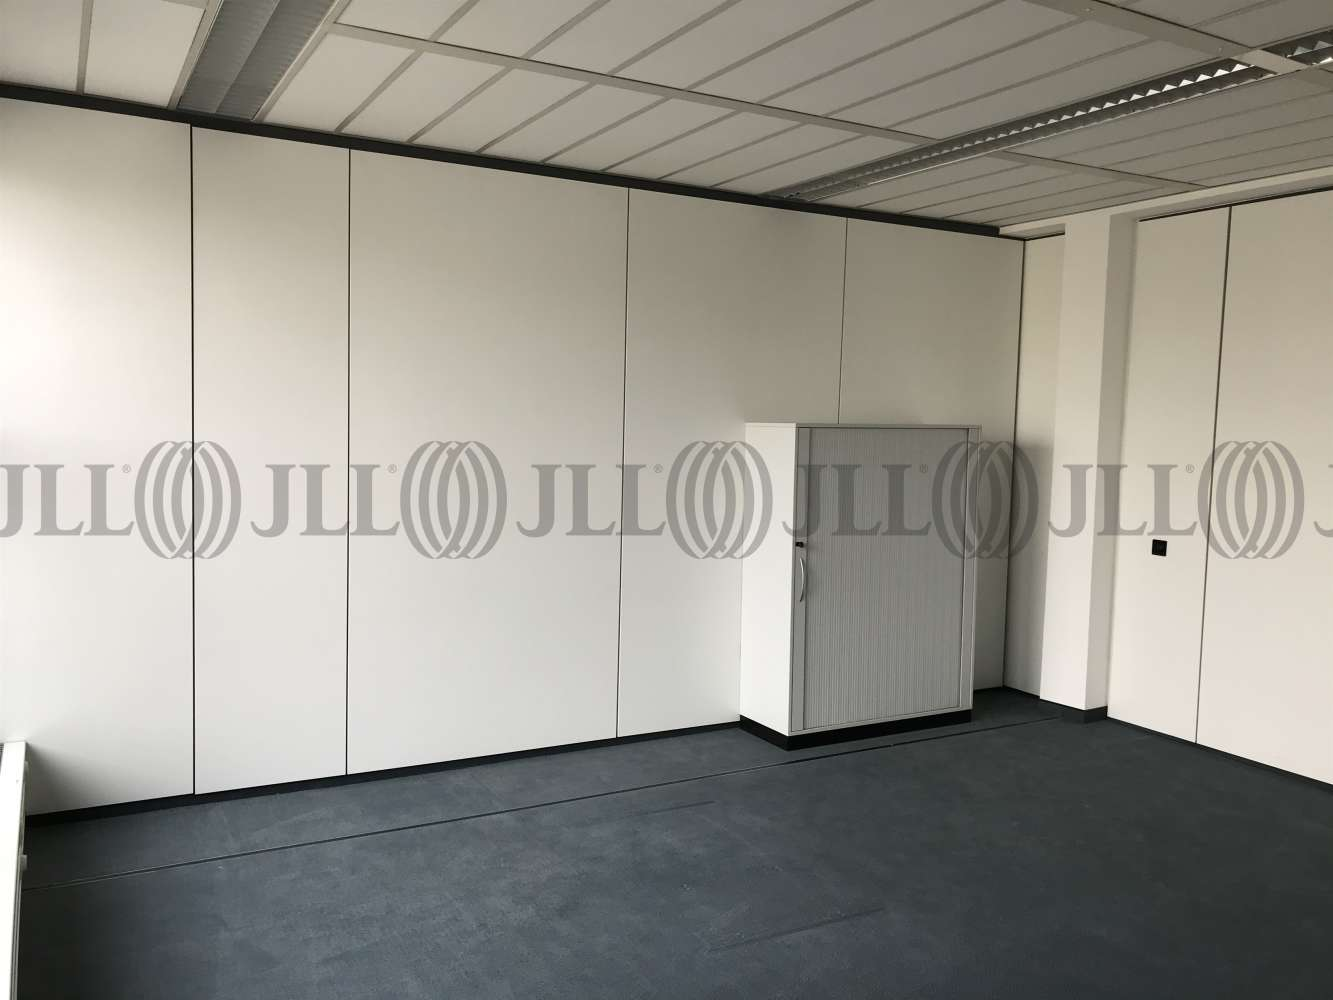 Büros Leinfelden-echterdingen, 70771 - Büro - Leinfelden-Echterdingen, Echterdingen - S0005 - 10909933